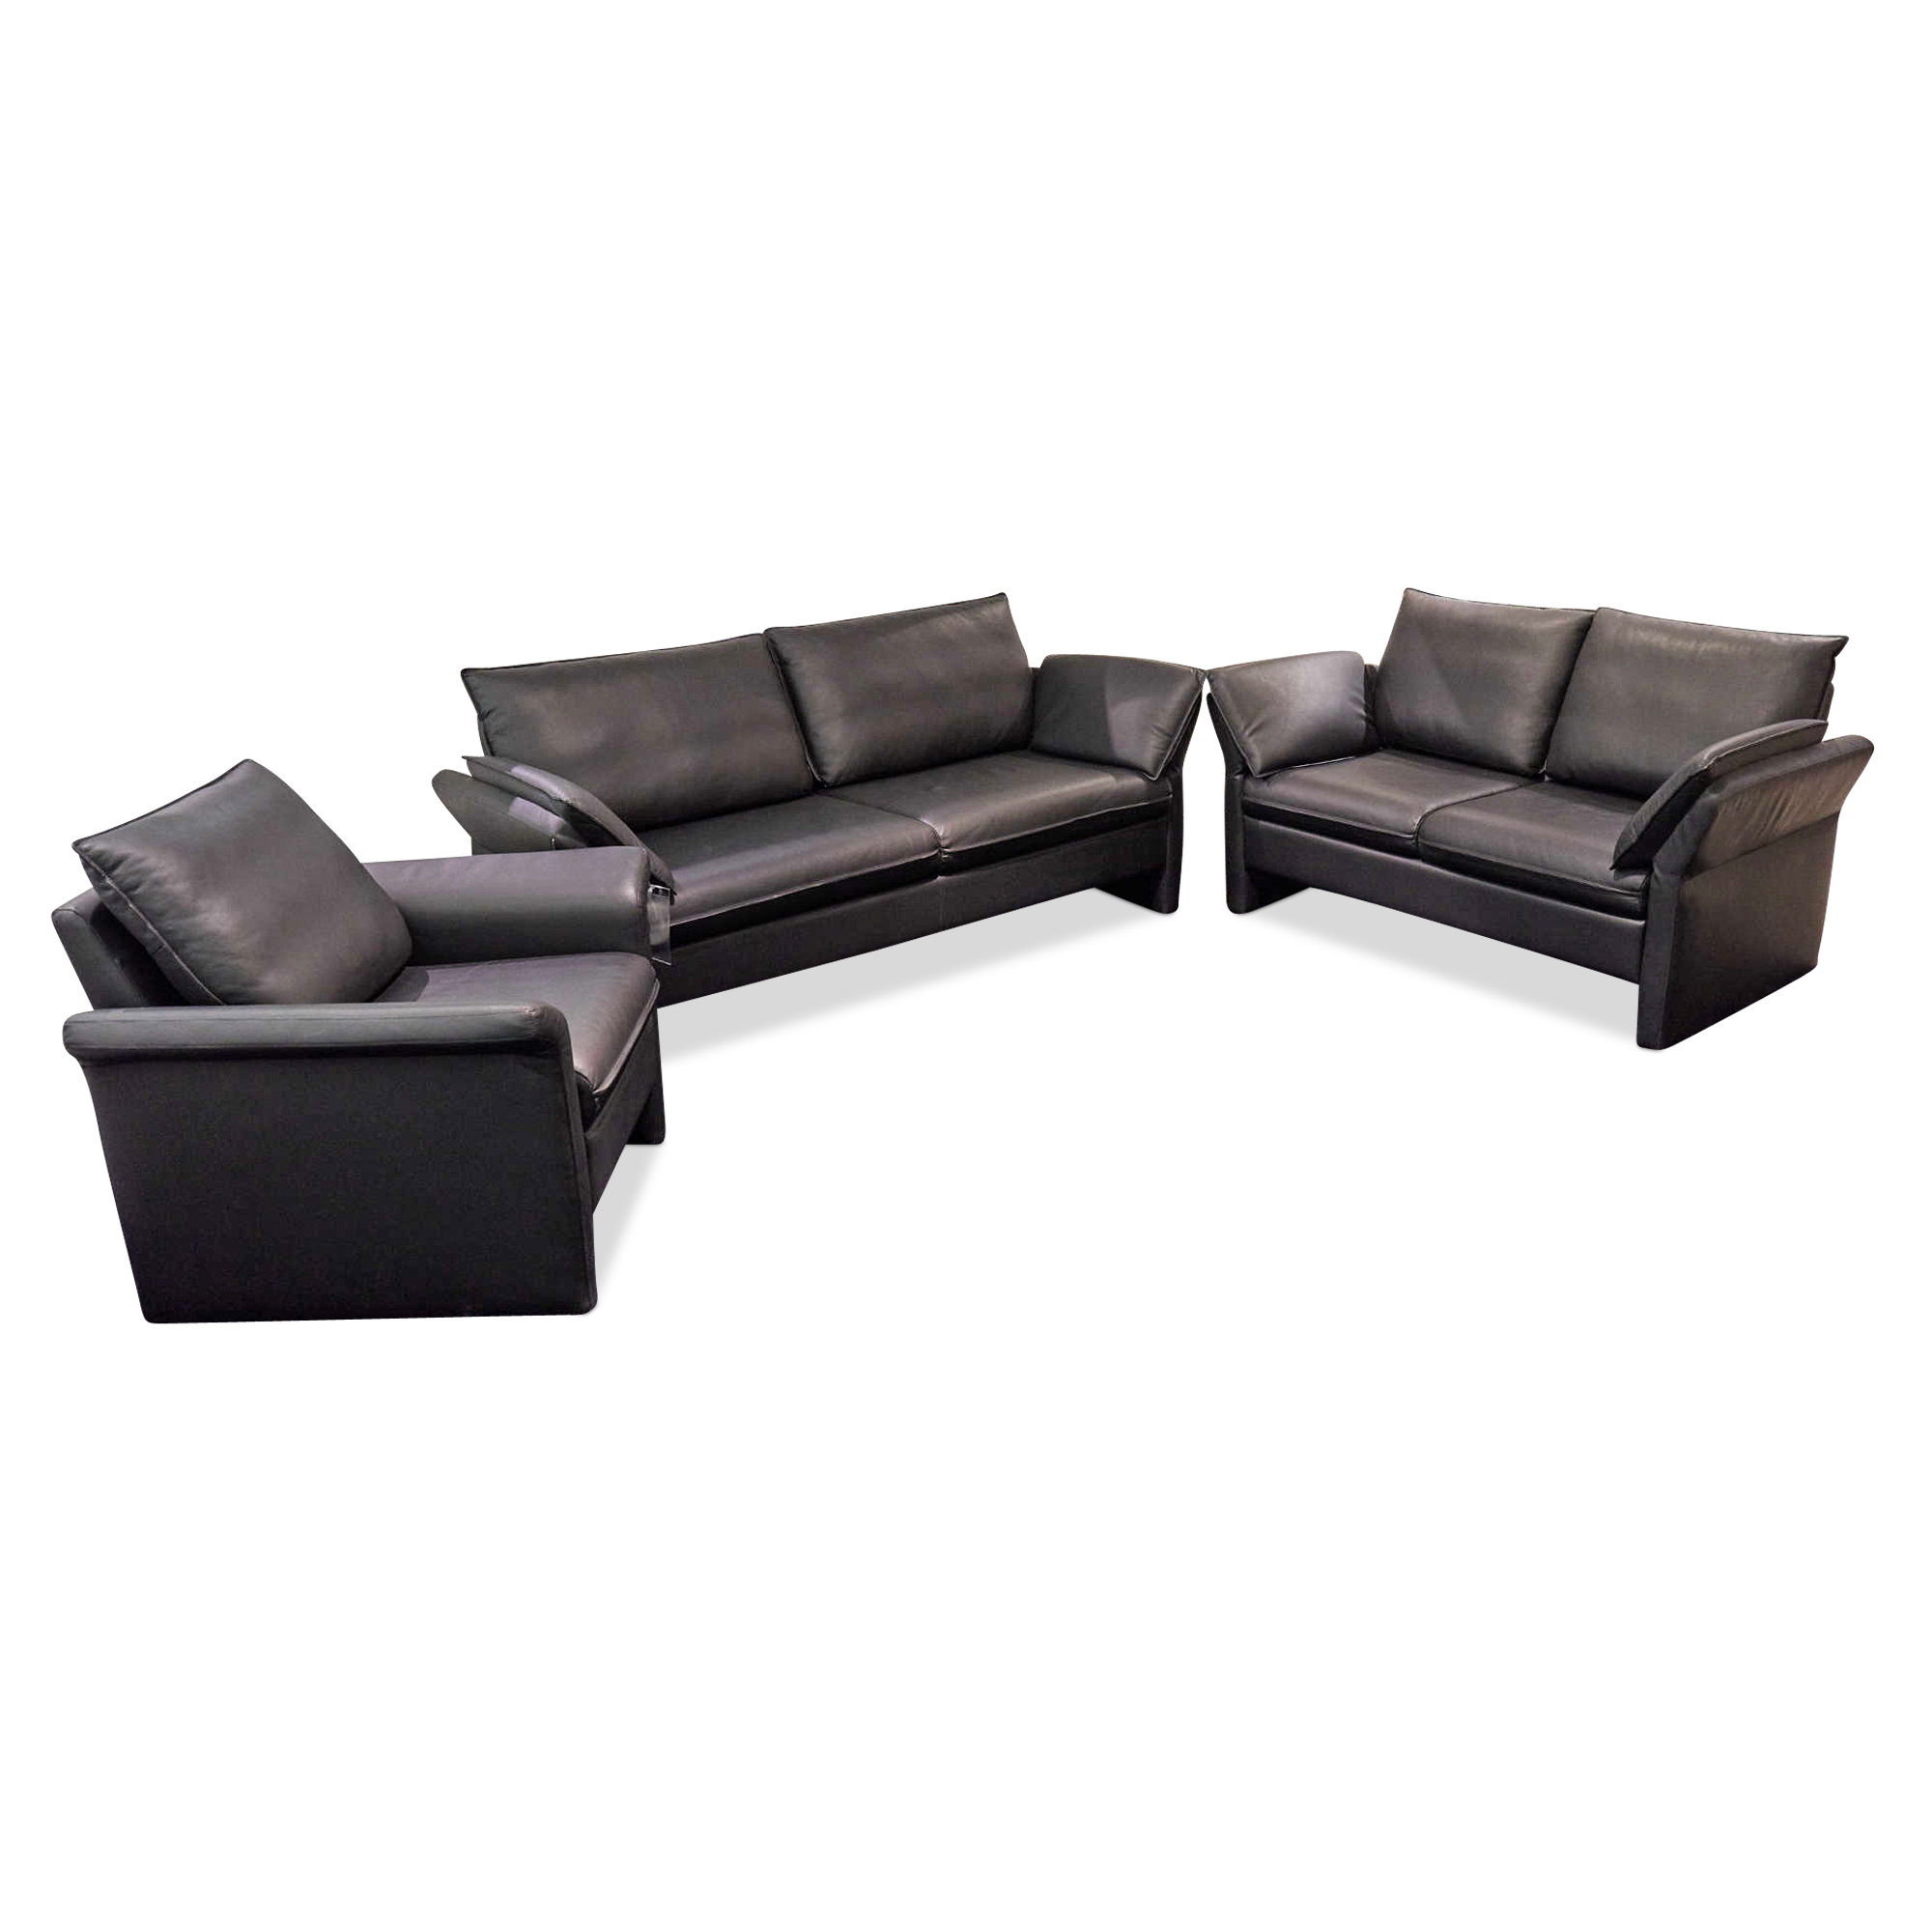 Garnitur Filou (2,5-Sitzer, 2-Sitzer, Sessel) – Frommholz – Sofas ...